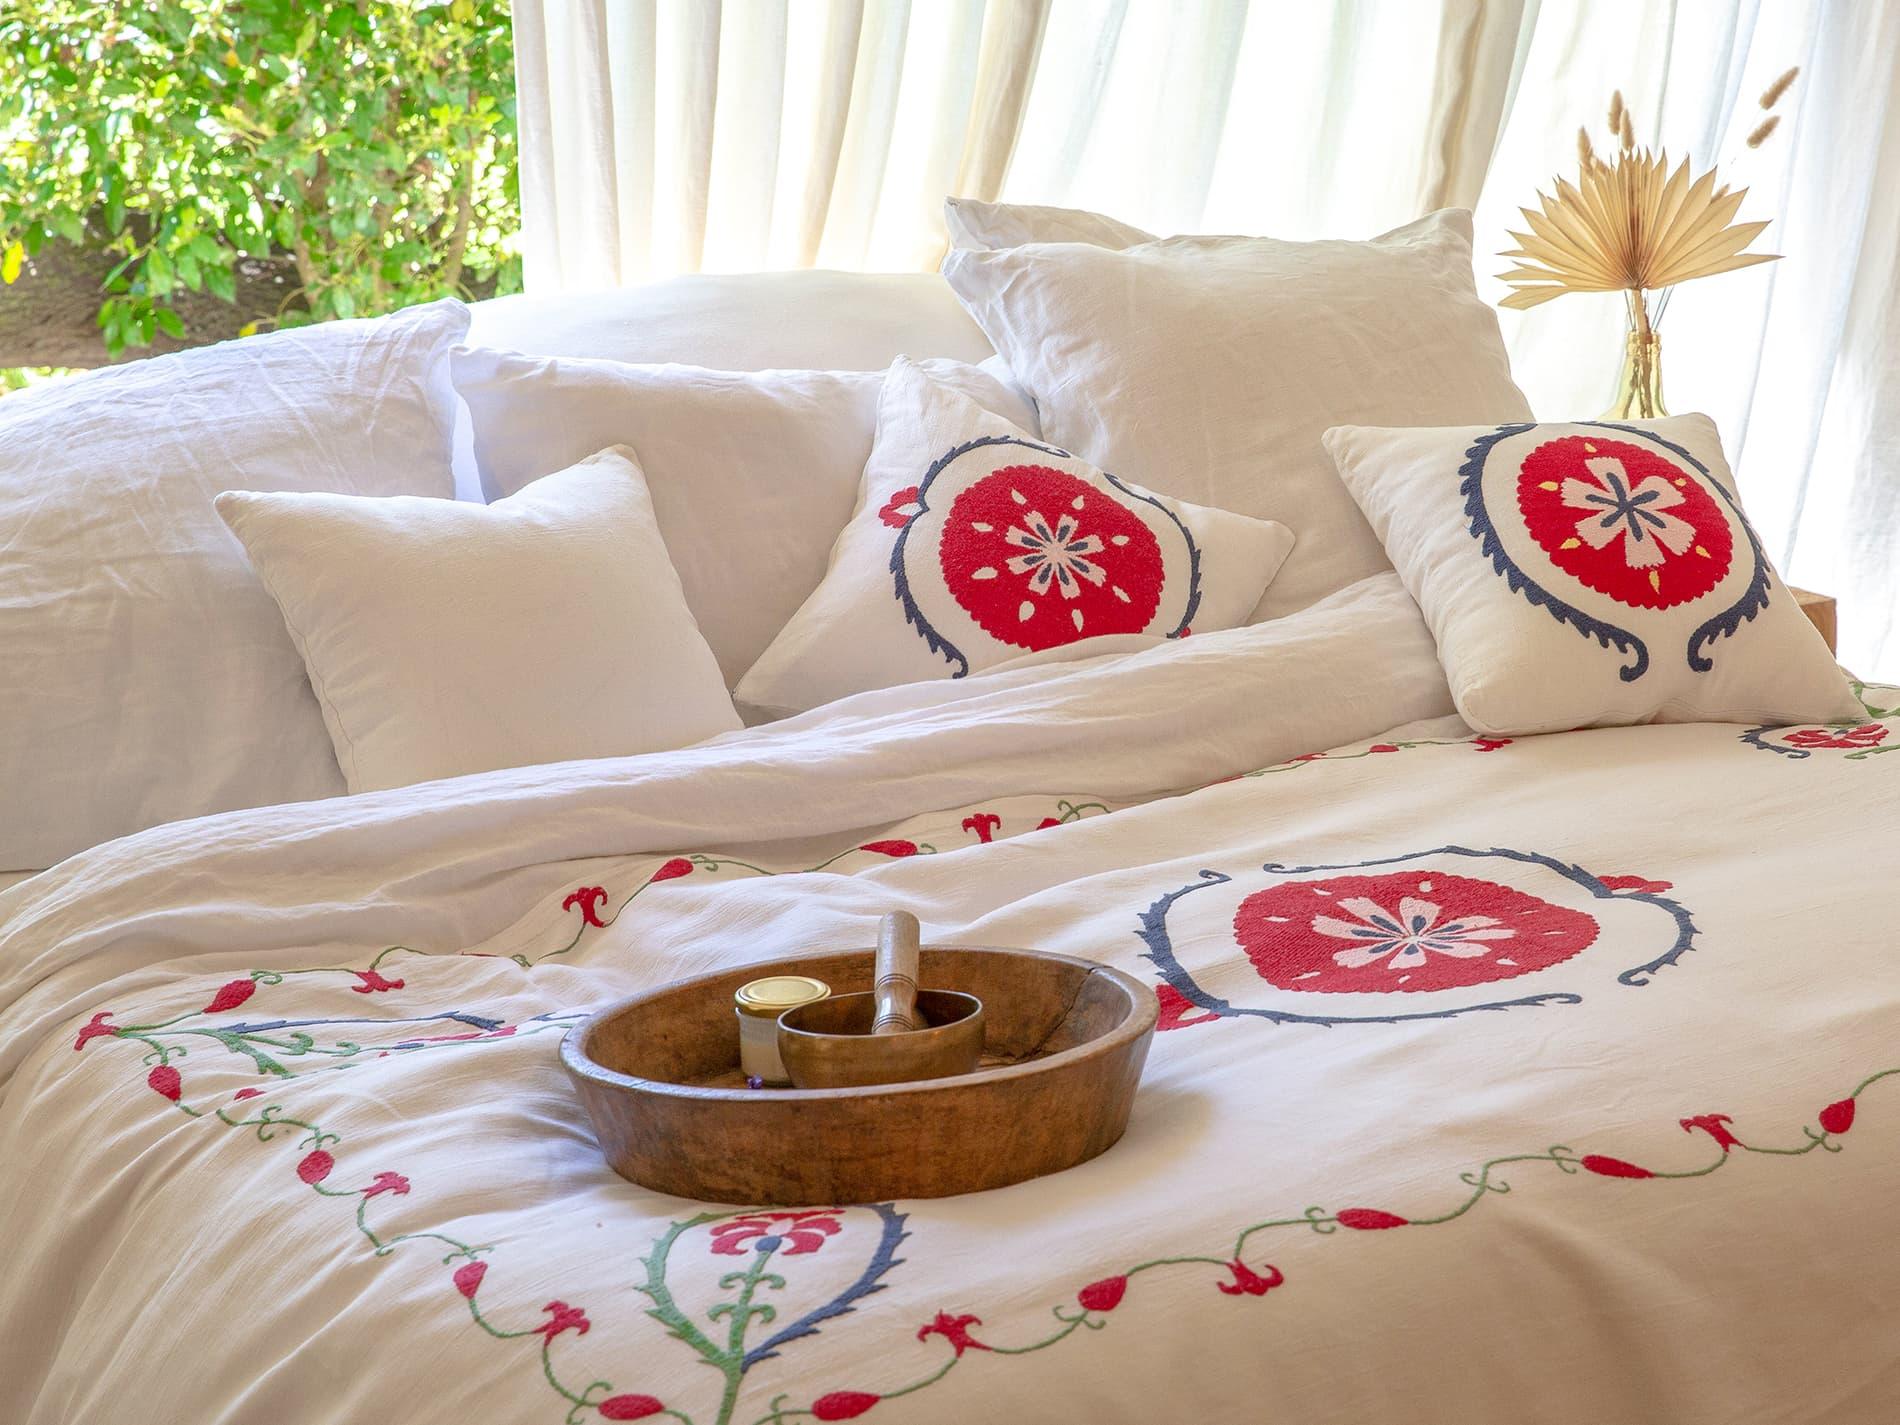 couvre lit ethnique Anor chambre